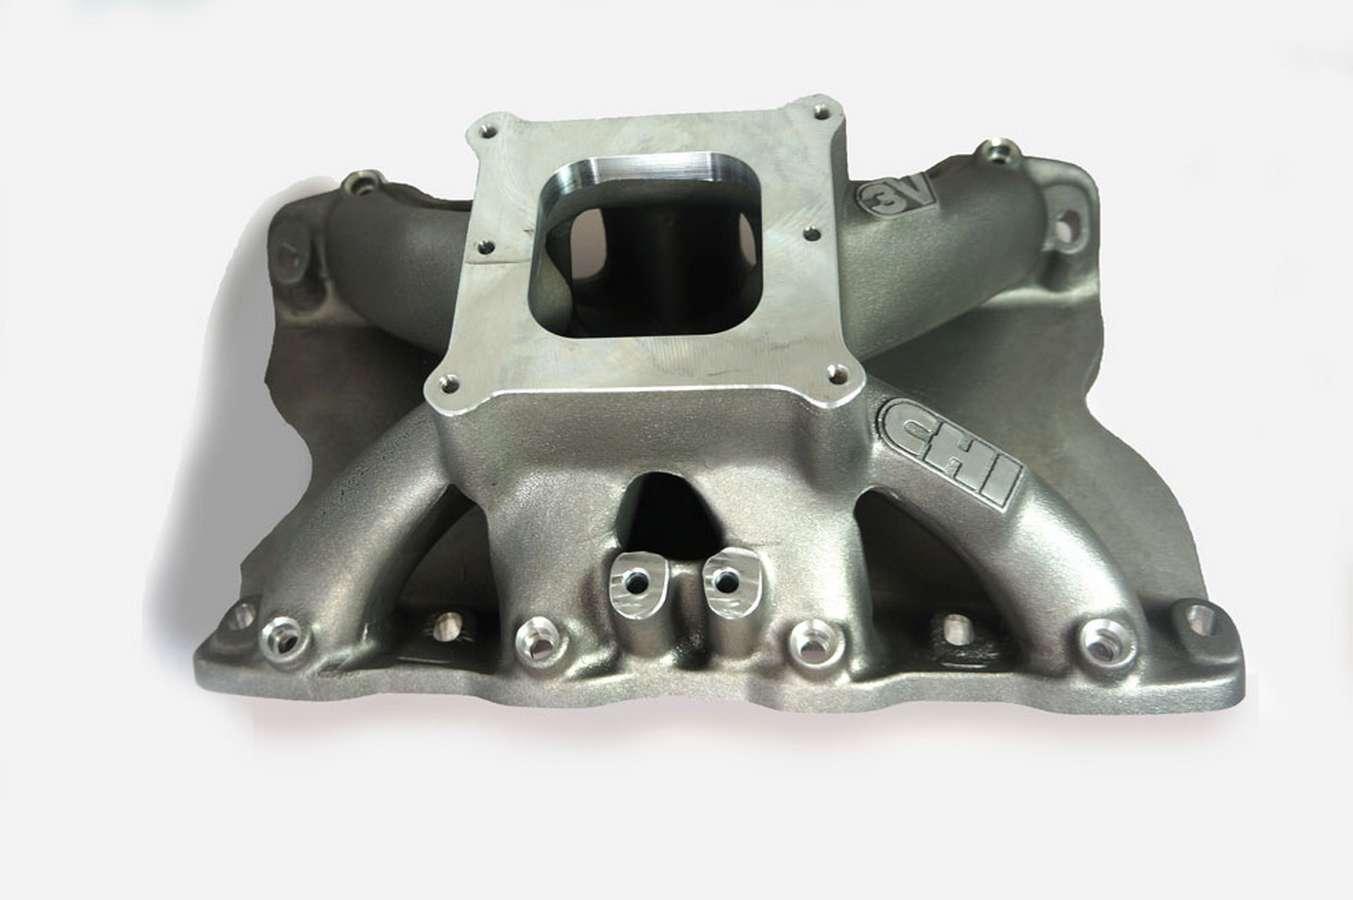 Intake Manifold - 3V 225cc Cleveland 9.2